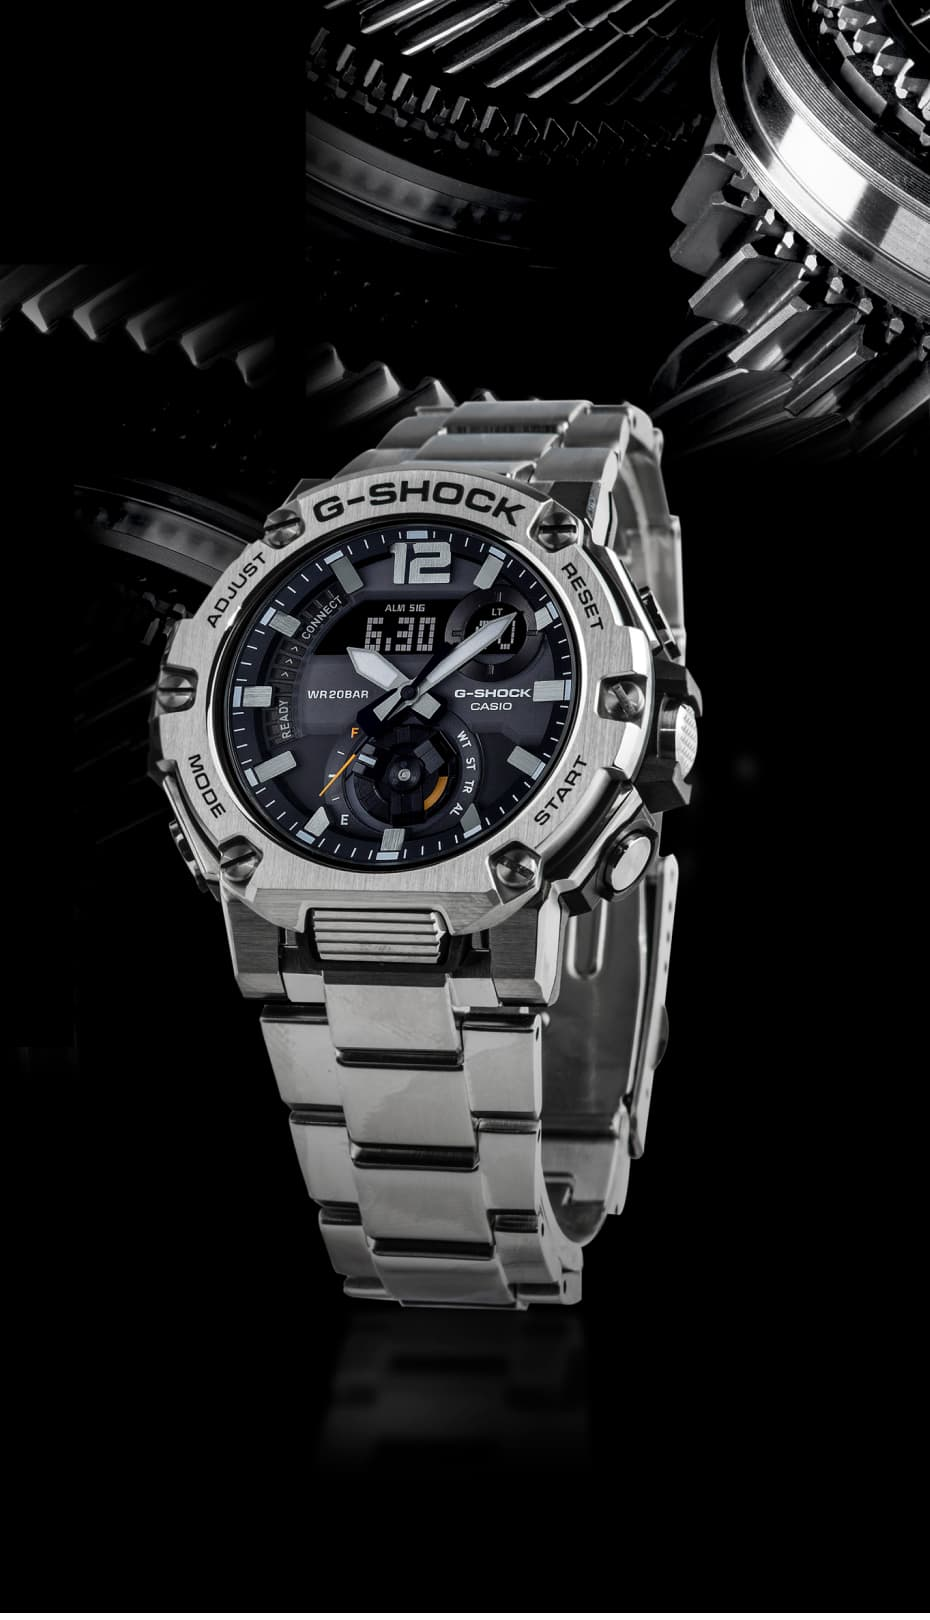 reloj de metal plateado g-shock de CASIO Cronoland